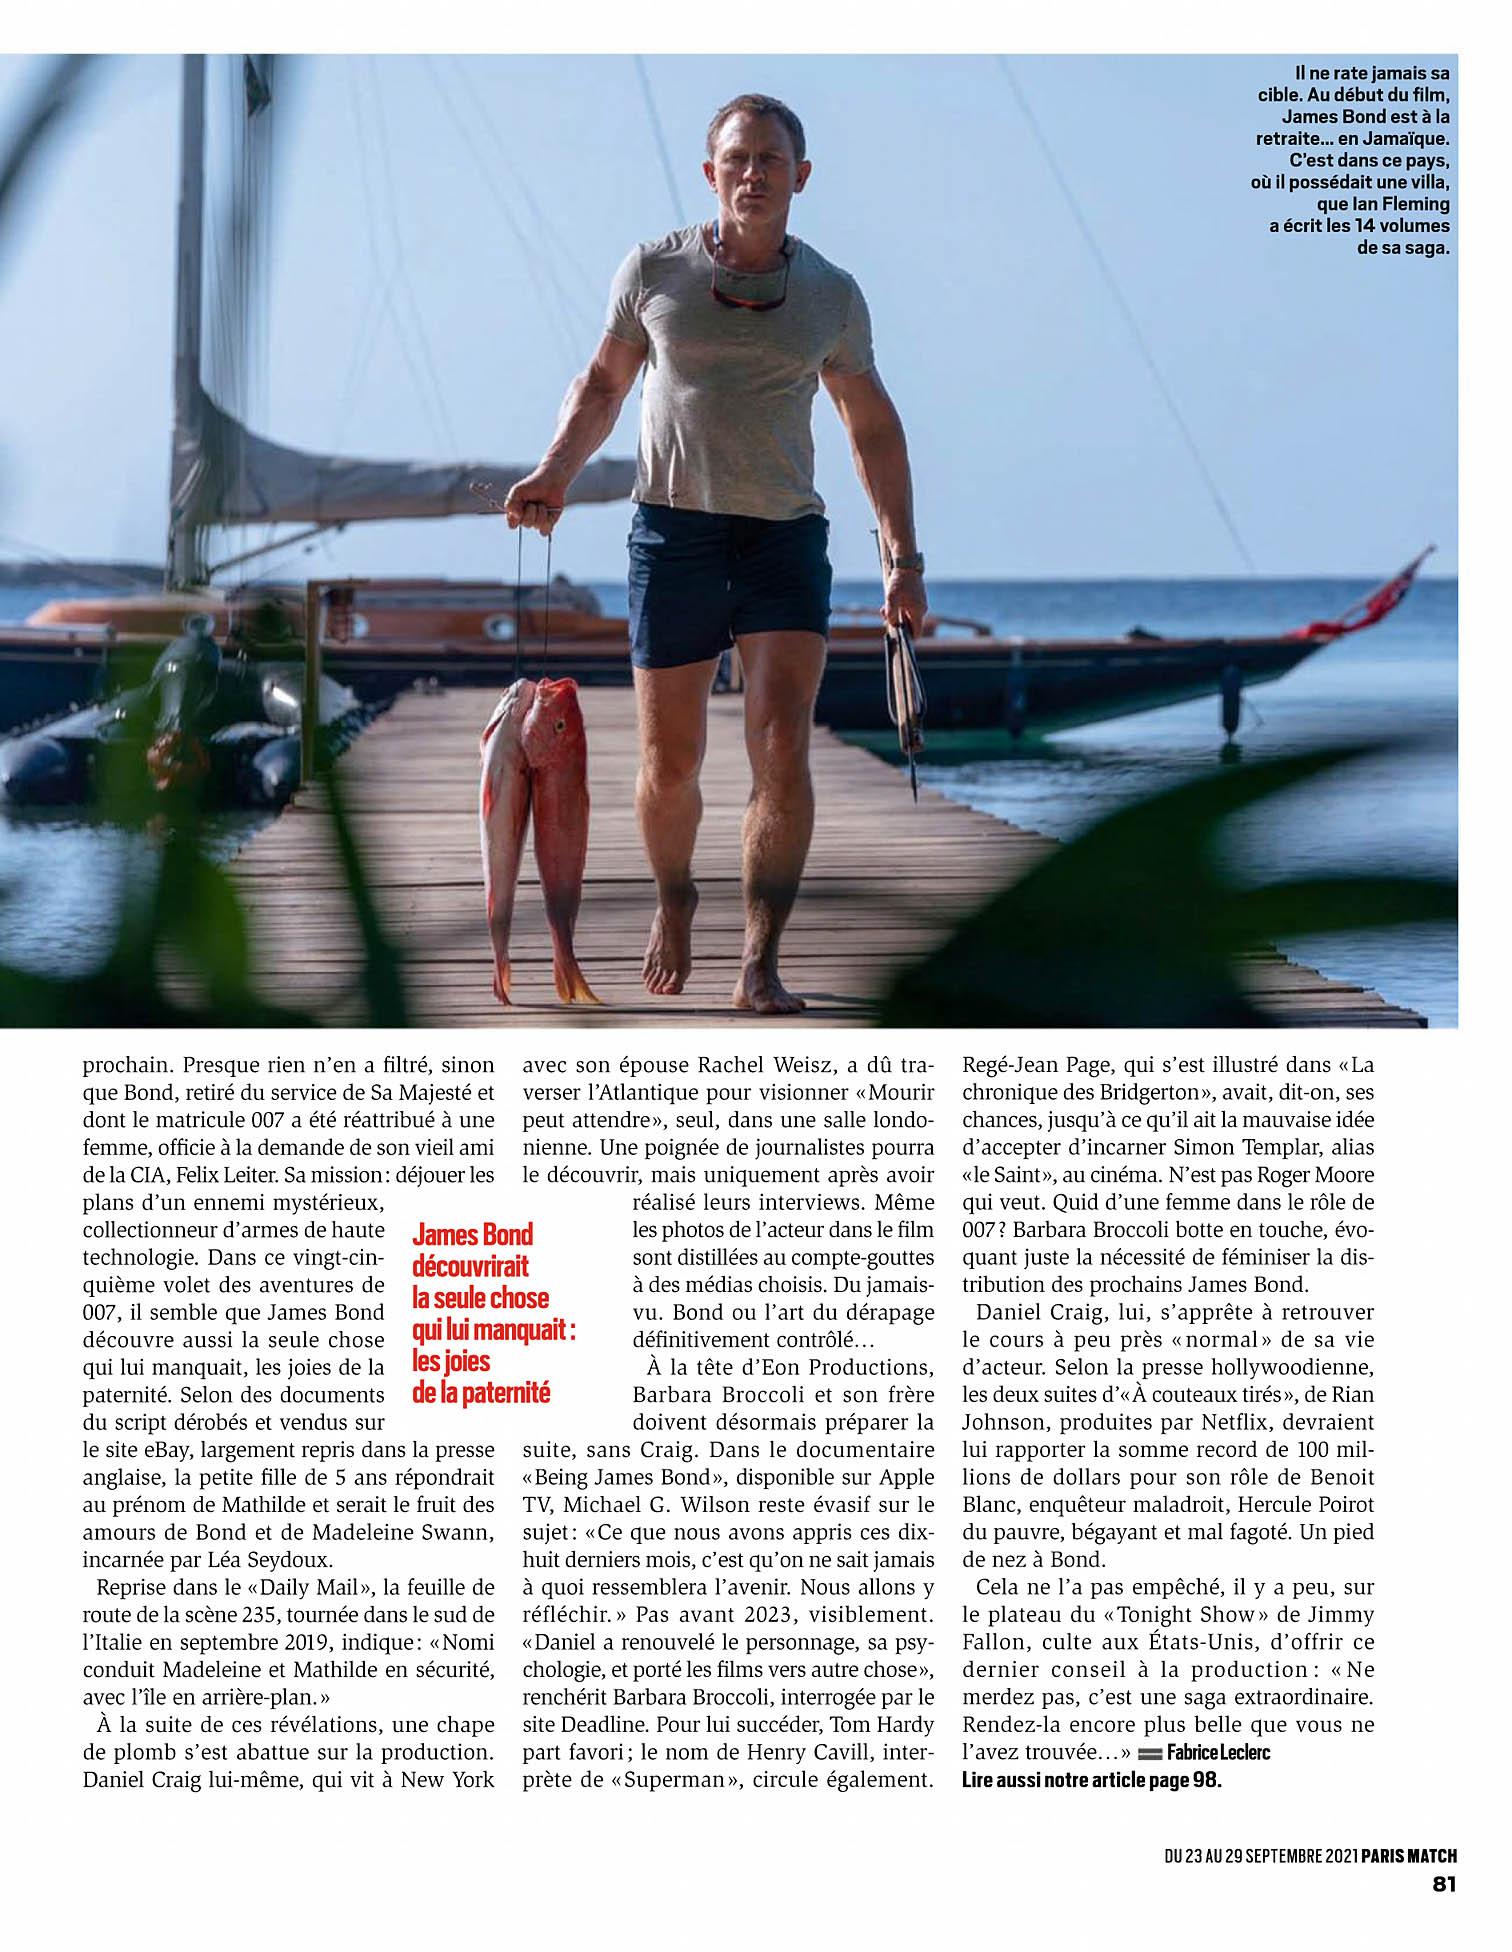 Paris Match 210923 Bond 04.jpg